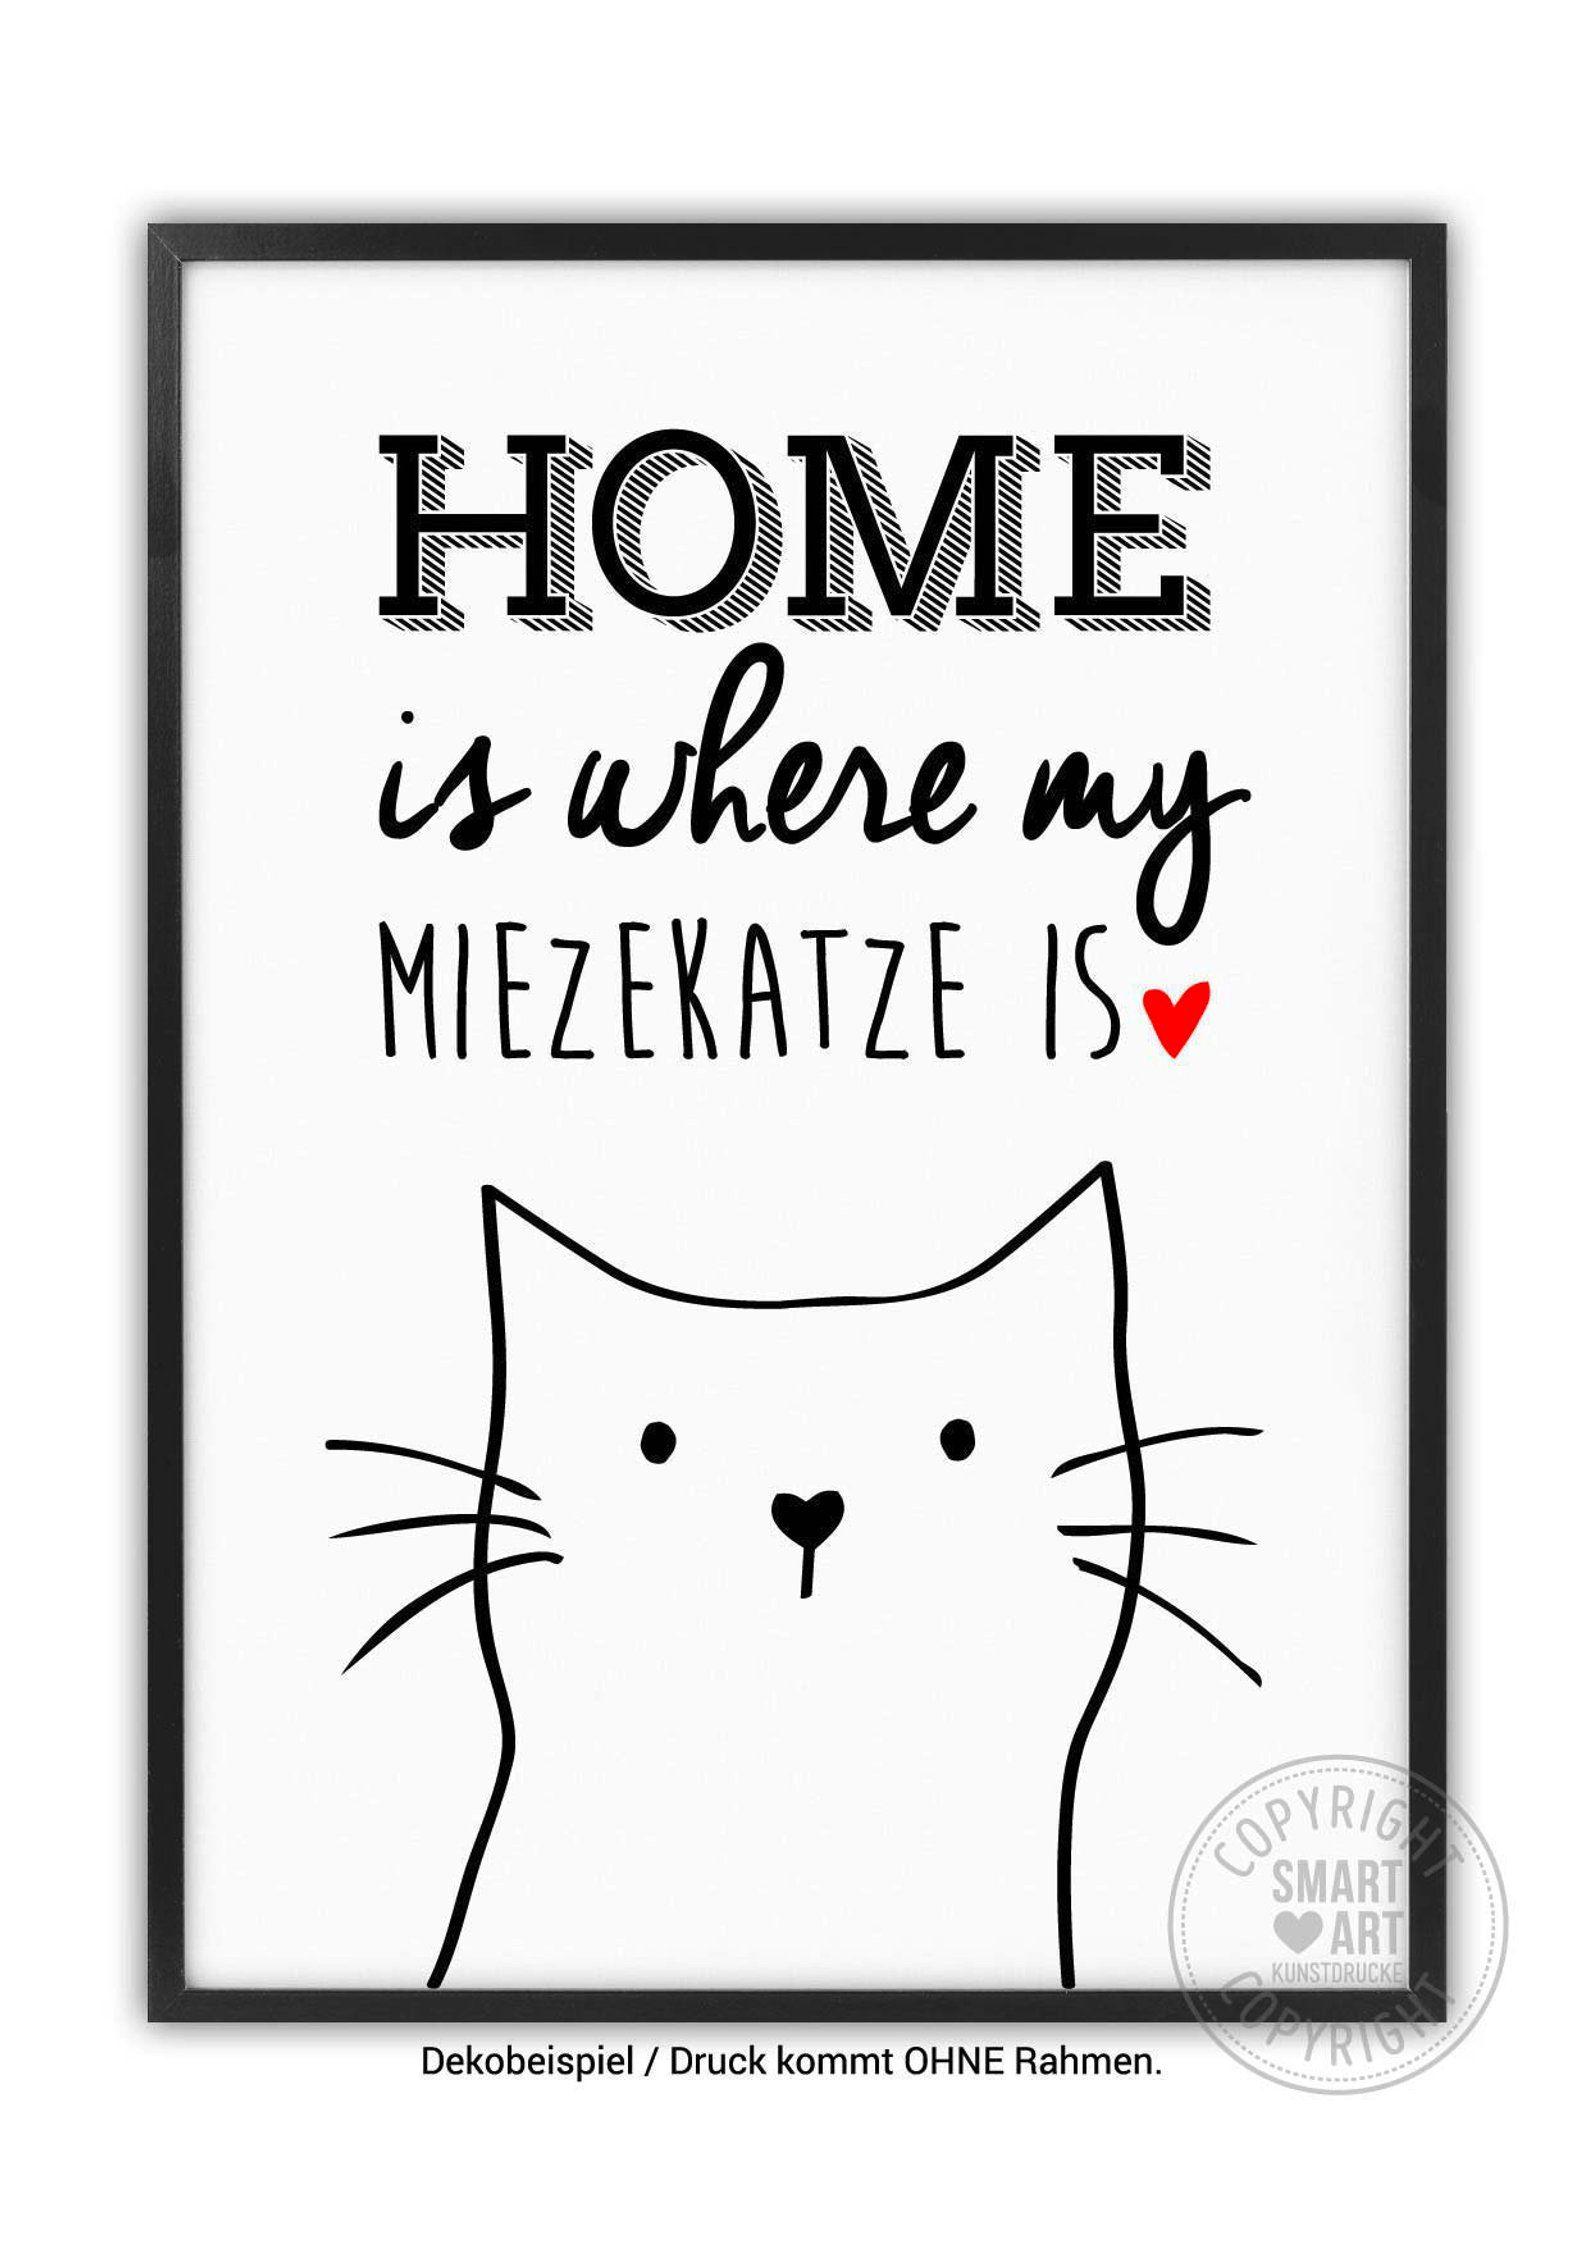 Miezekatze, SMART ART Kunstdrucke Druck A4 A3 Geschenk Katzen Bild Poster Katzenliebhaber Zuhause Einzugsgeschenk Katzenliebhaber